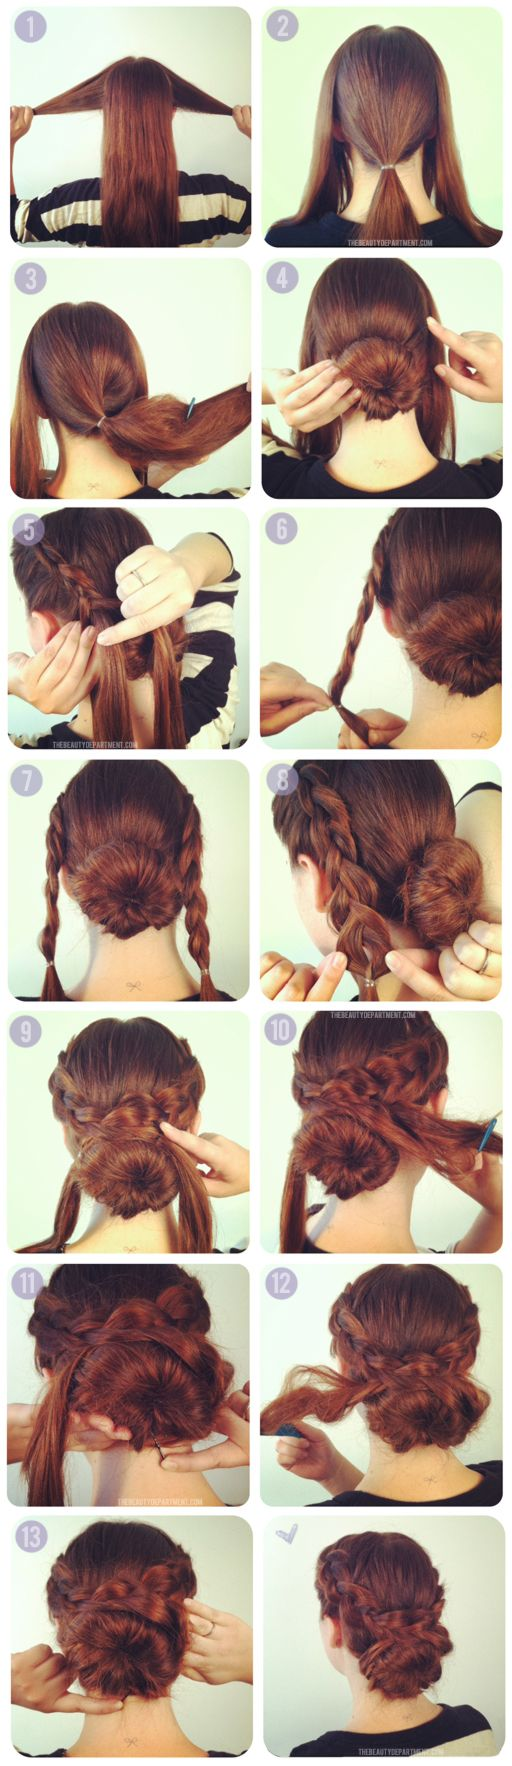 double braided bun